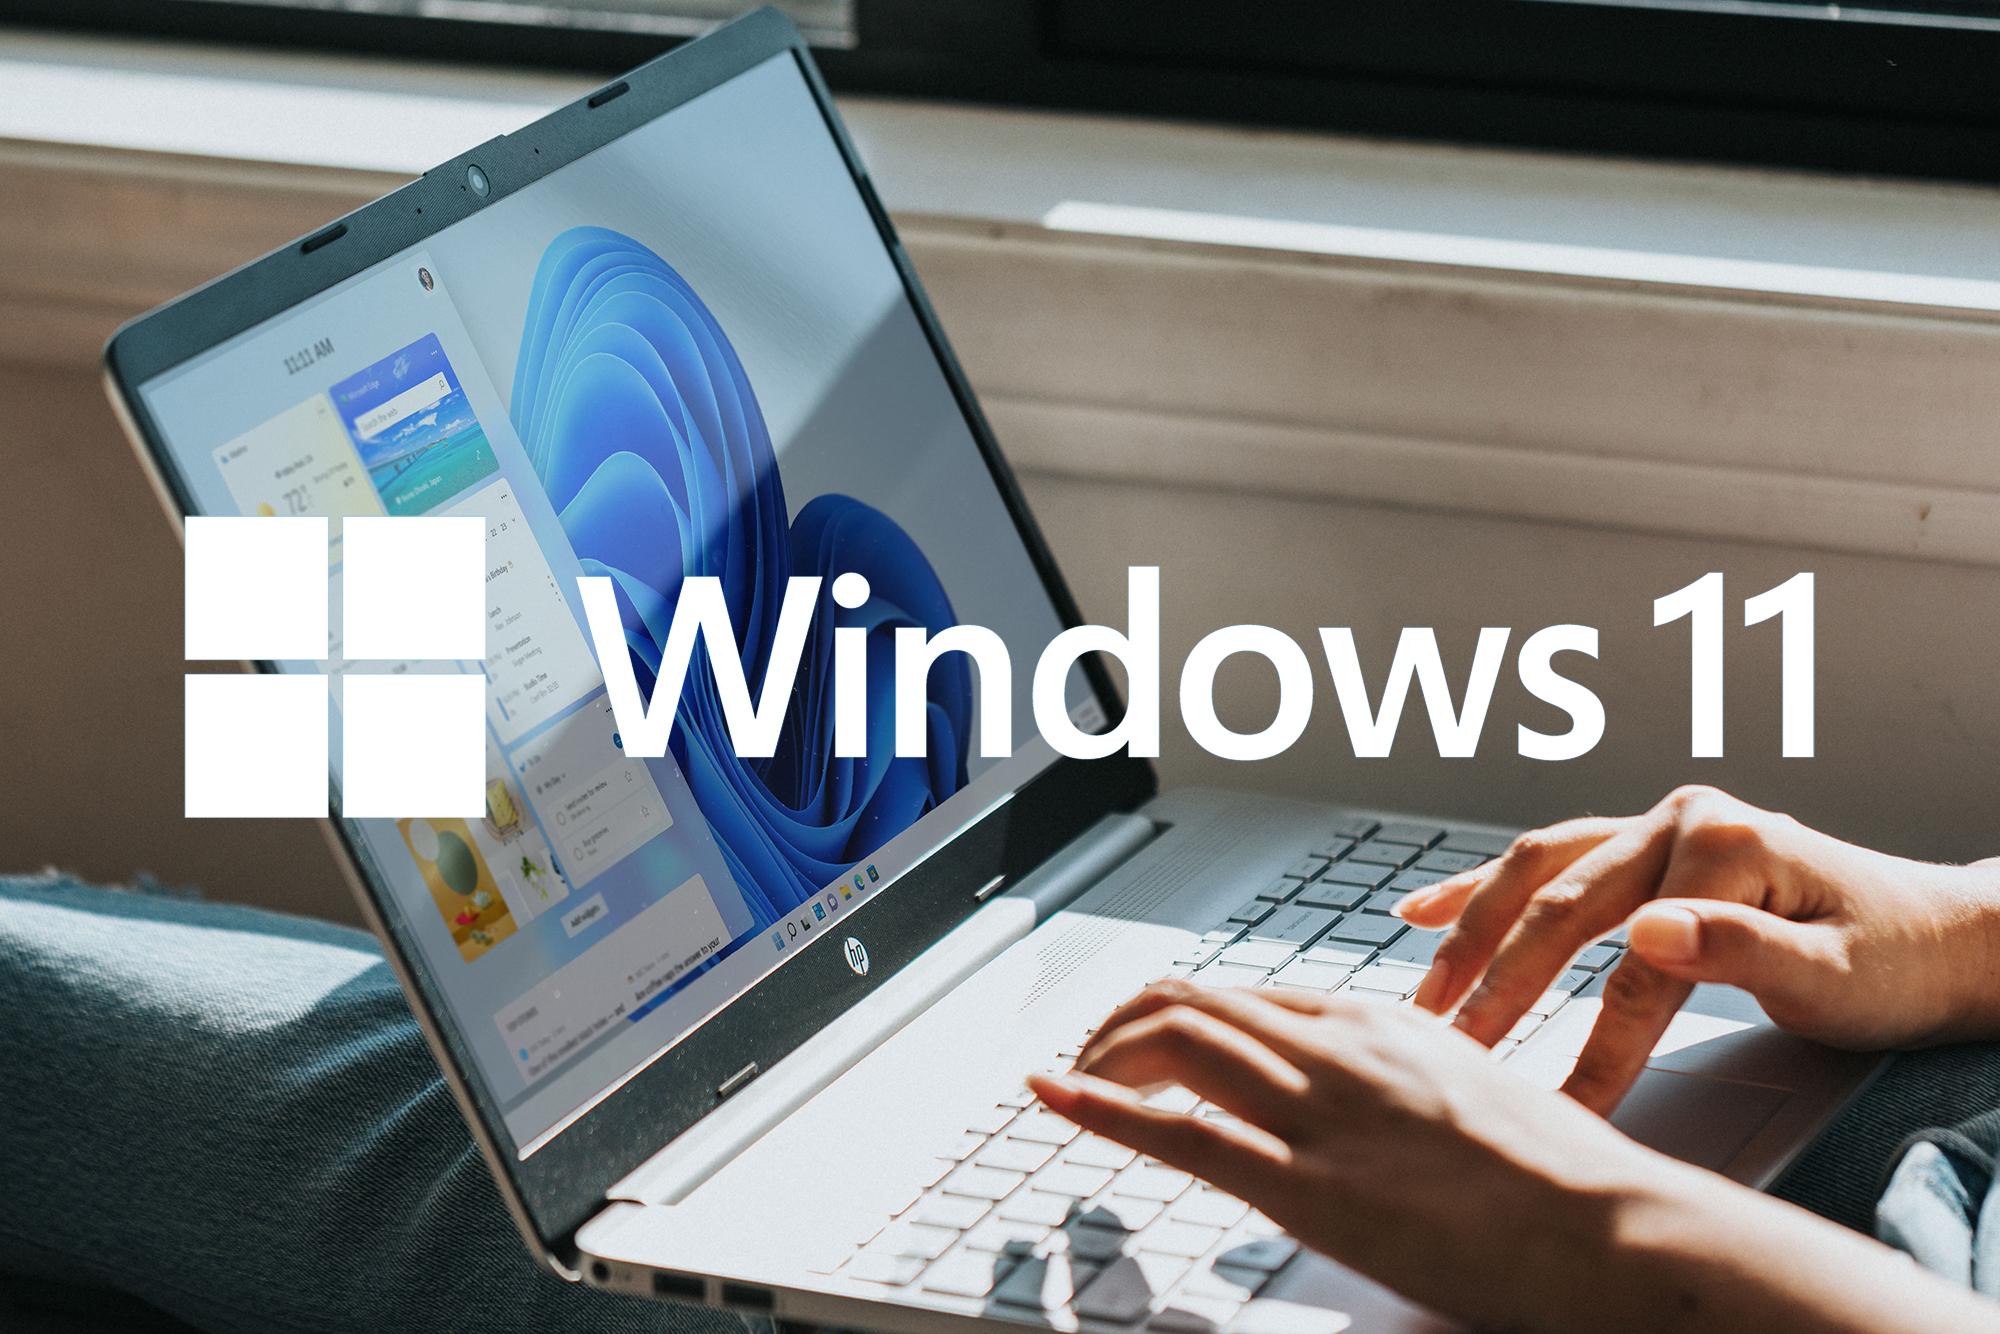 Windows 11 - What's new?